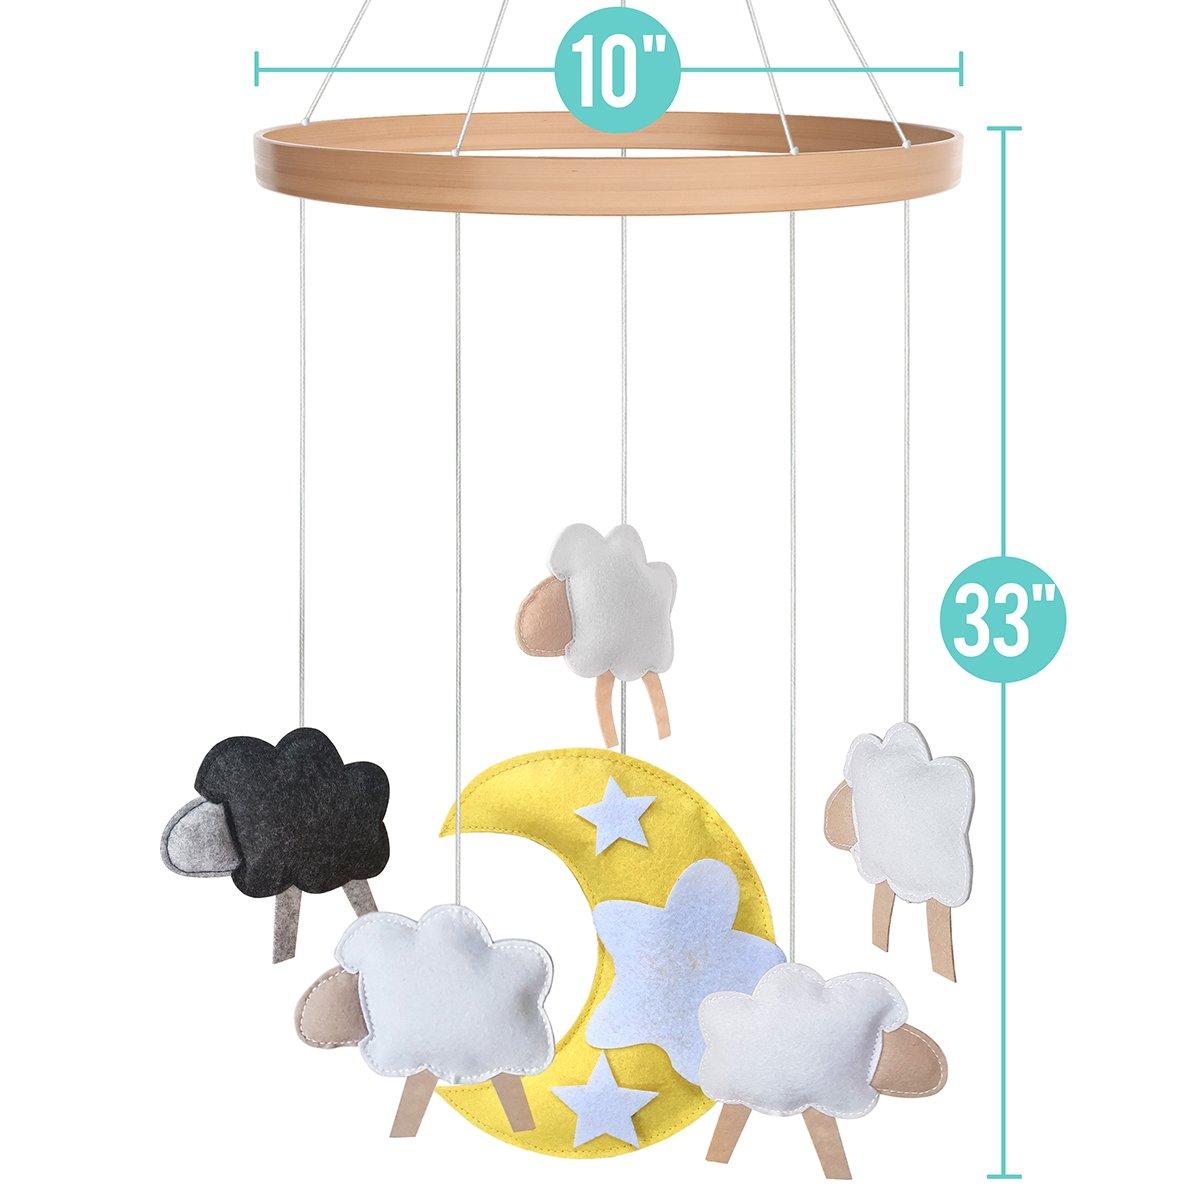 B/éb/é Lit Mobile/ /Jouets pour gar/çons Filles par I Love Bub Baa Baa Black Sheep